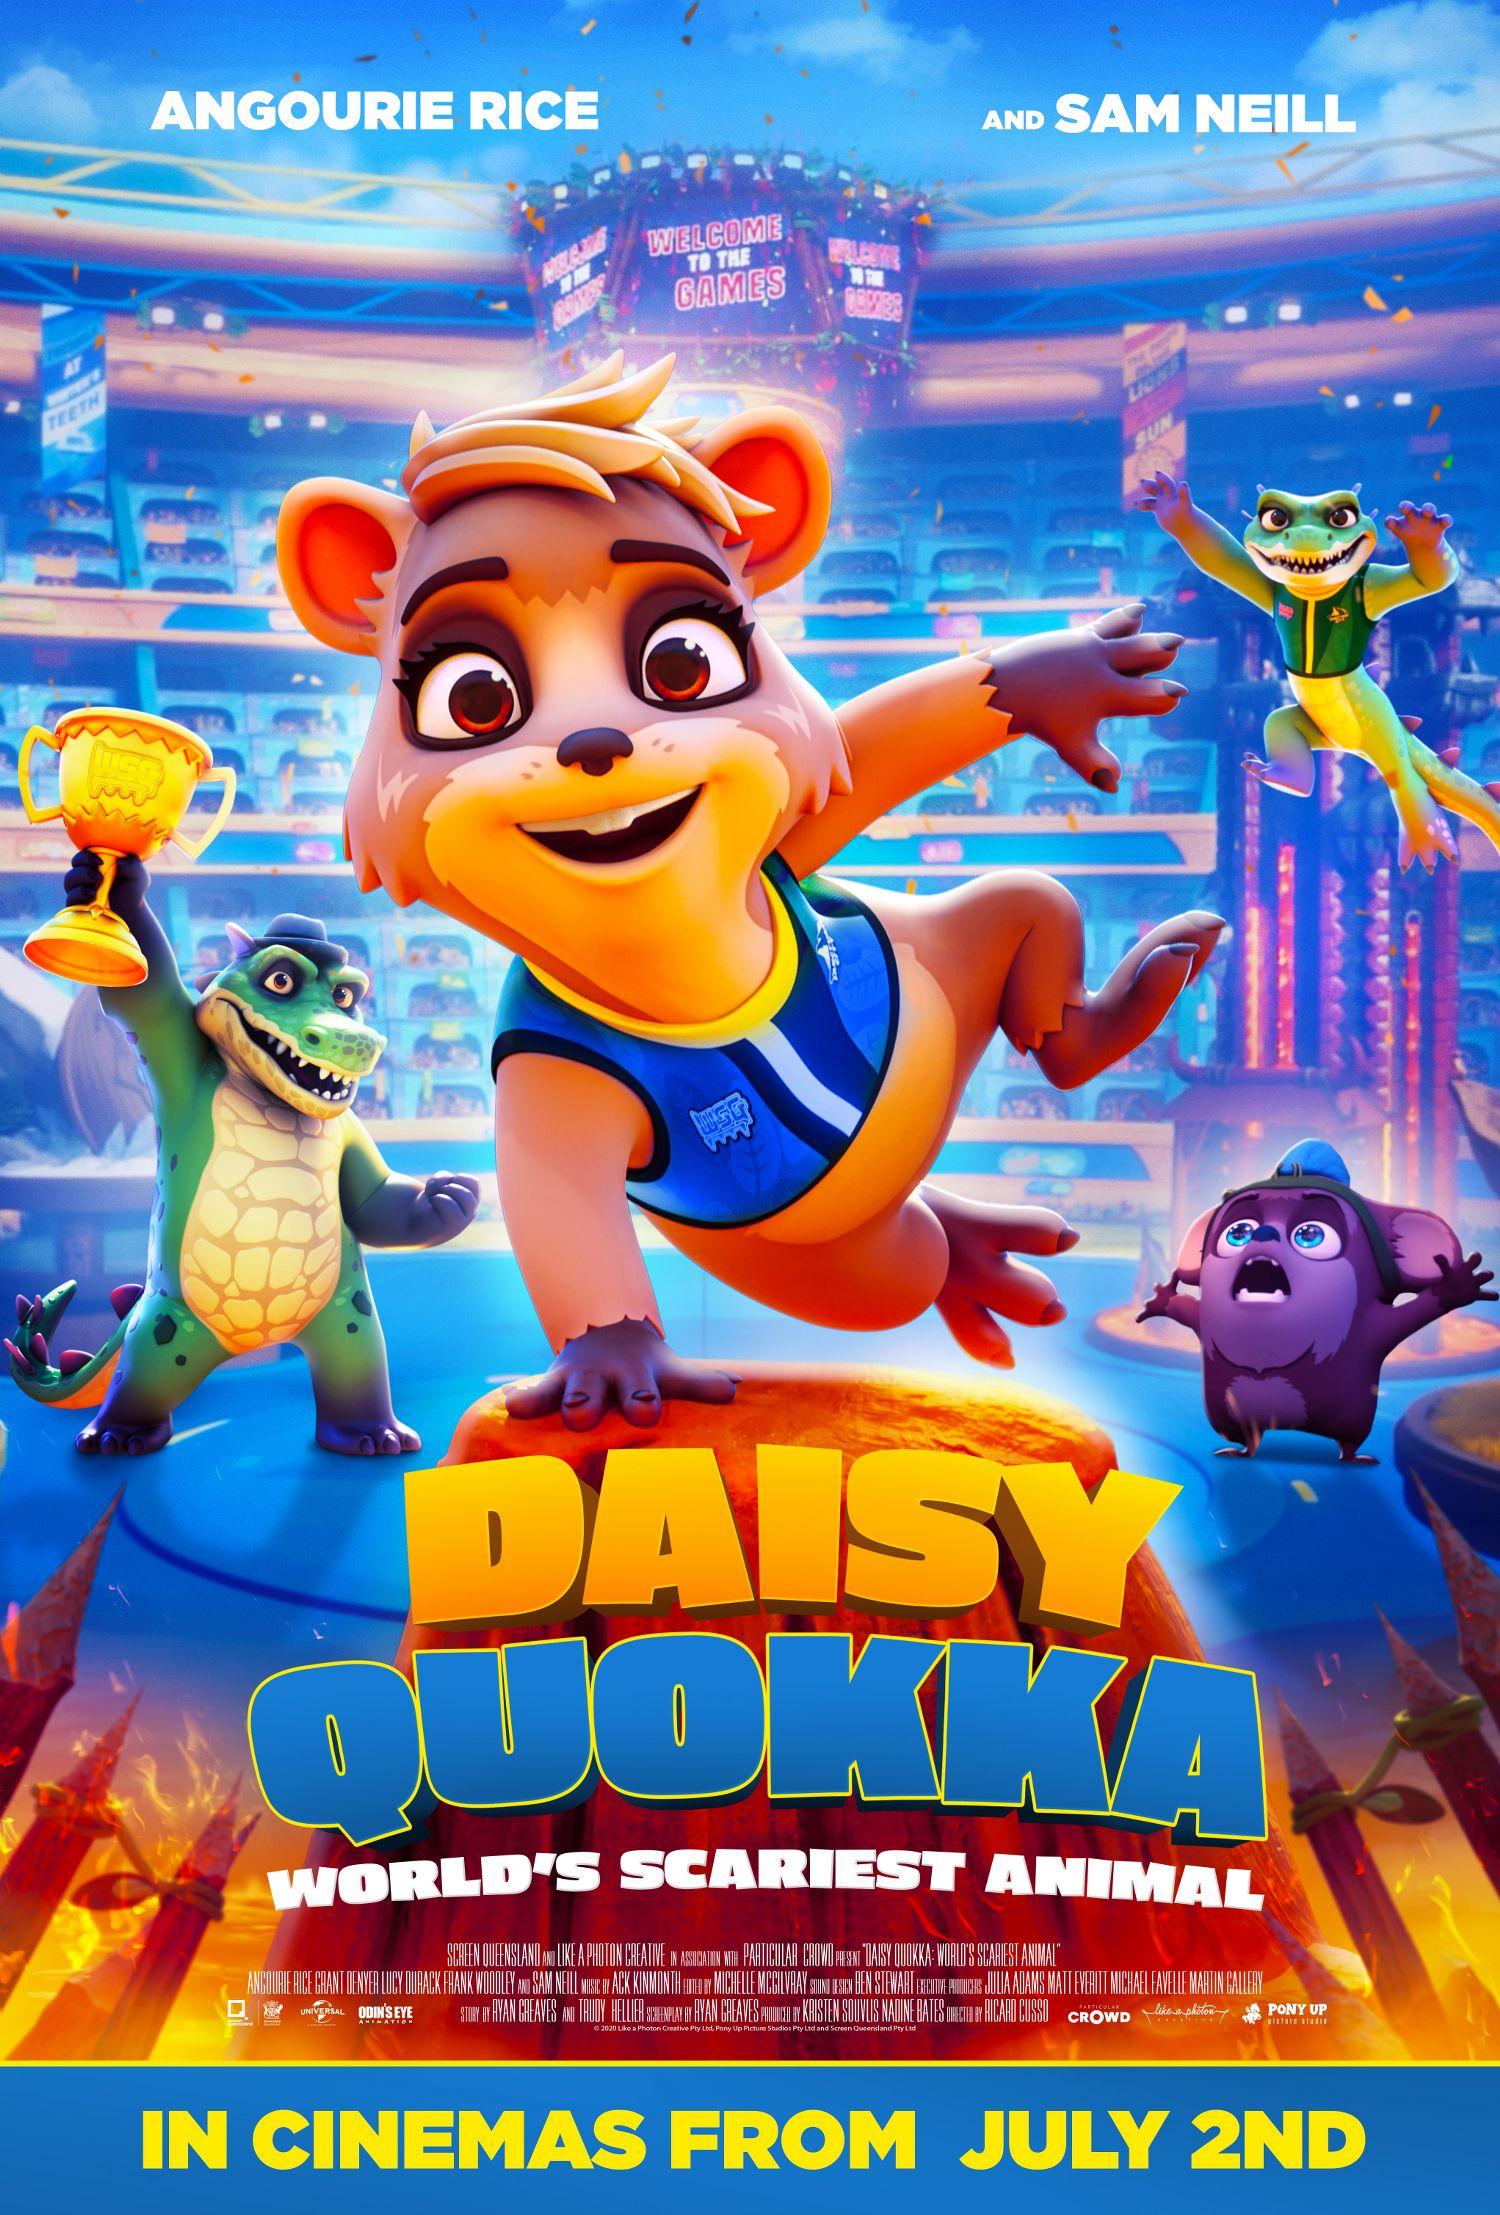 Daisy Quokka (Signature Entertainment) Cinema Poster